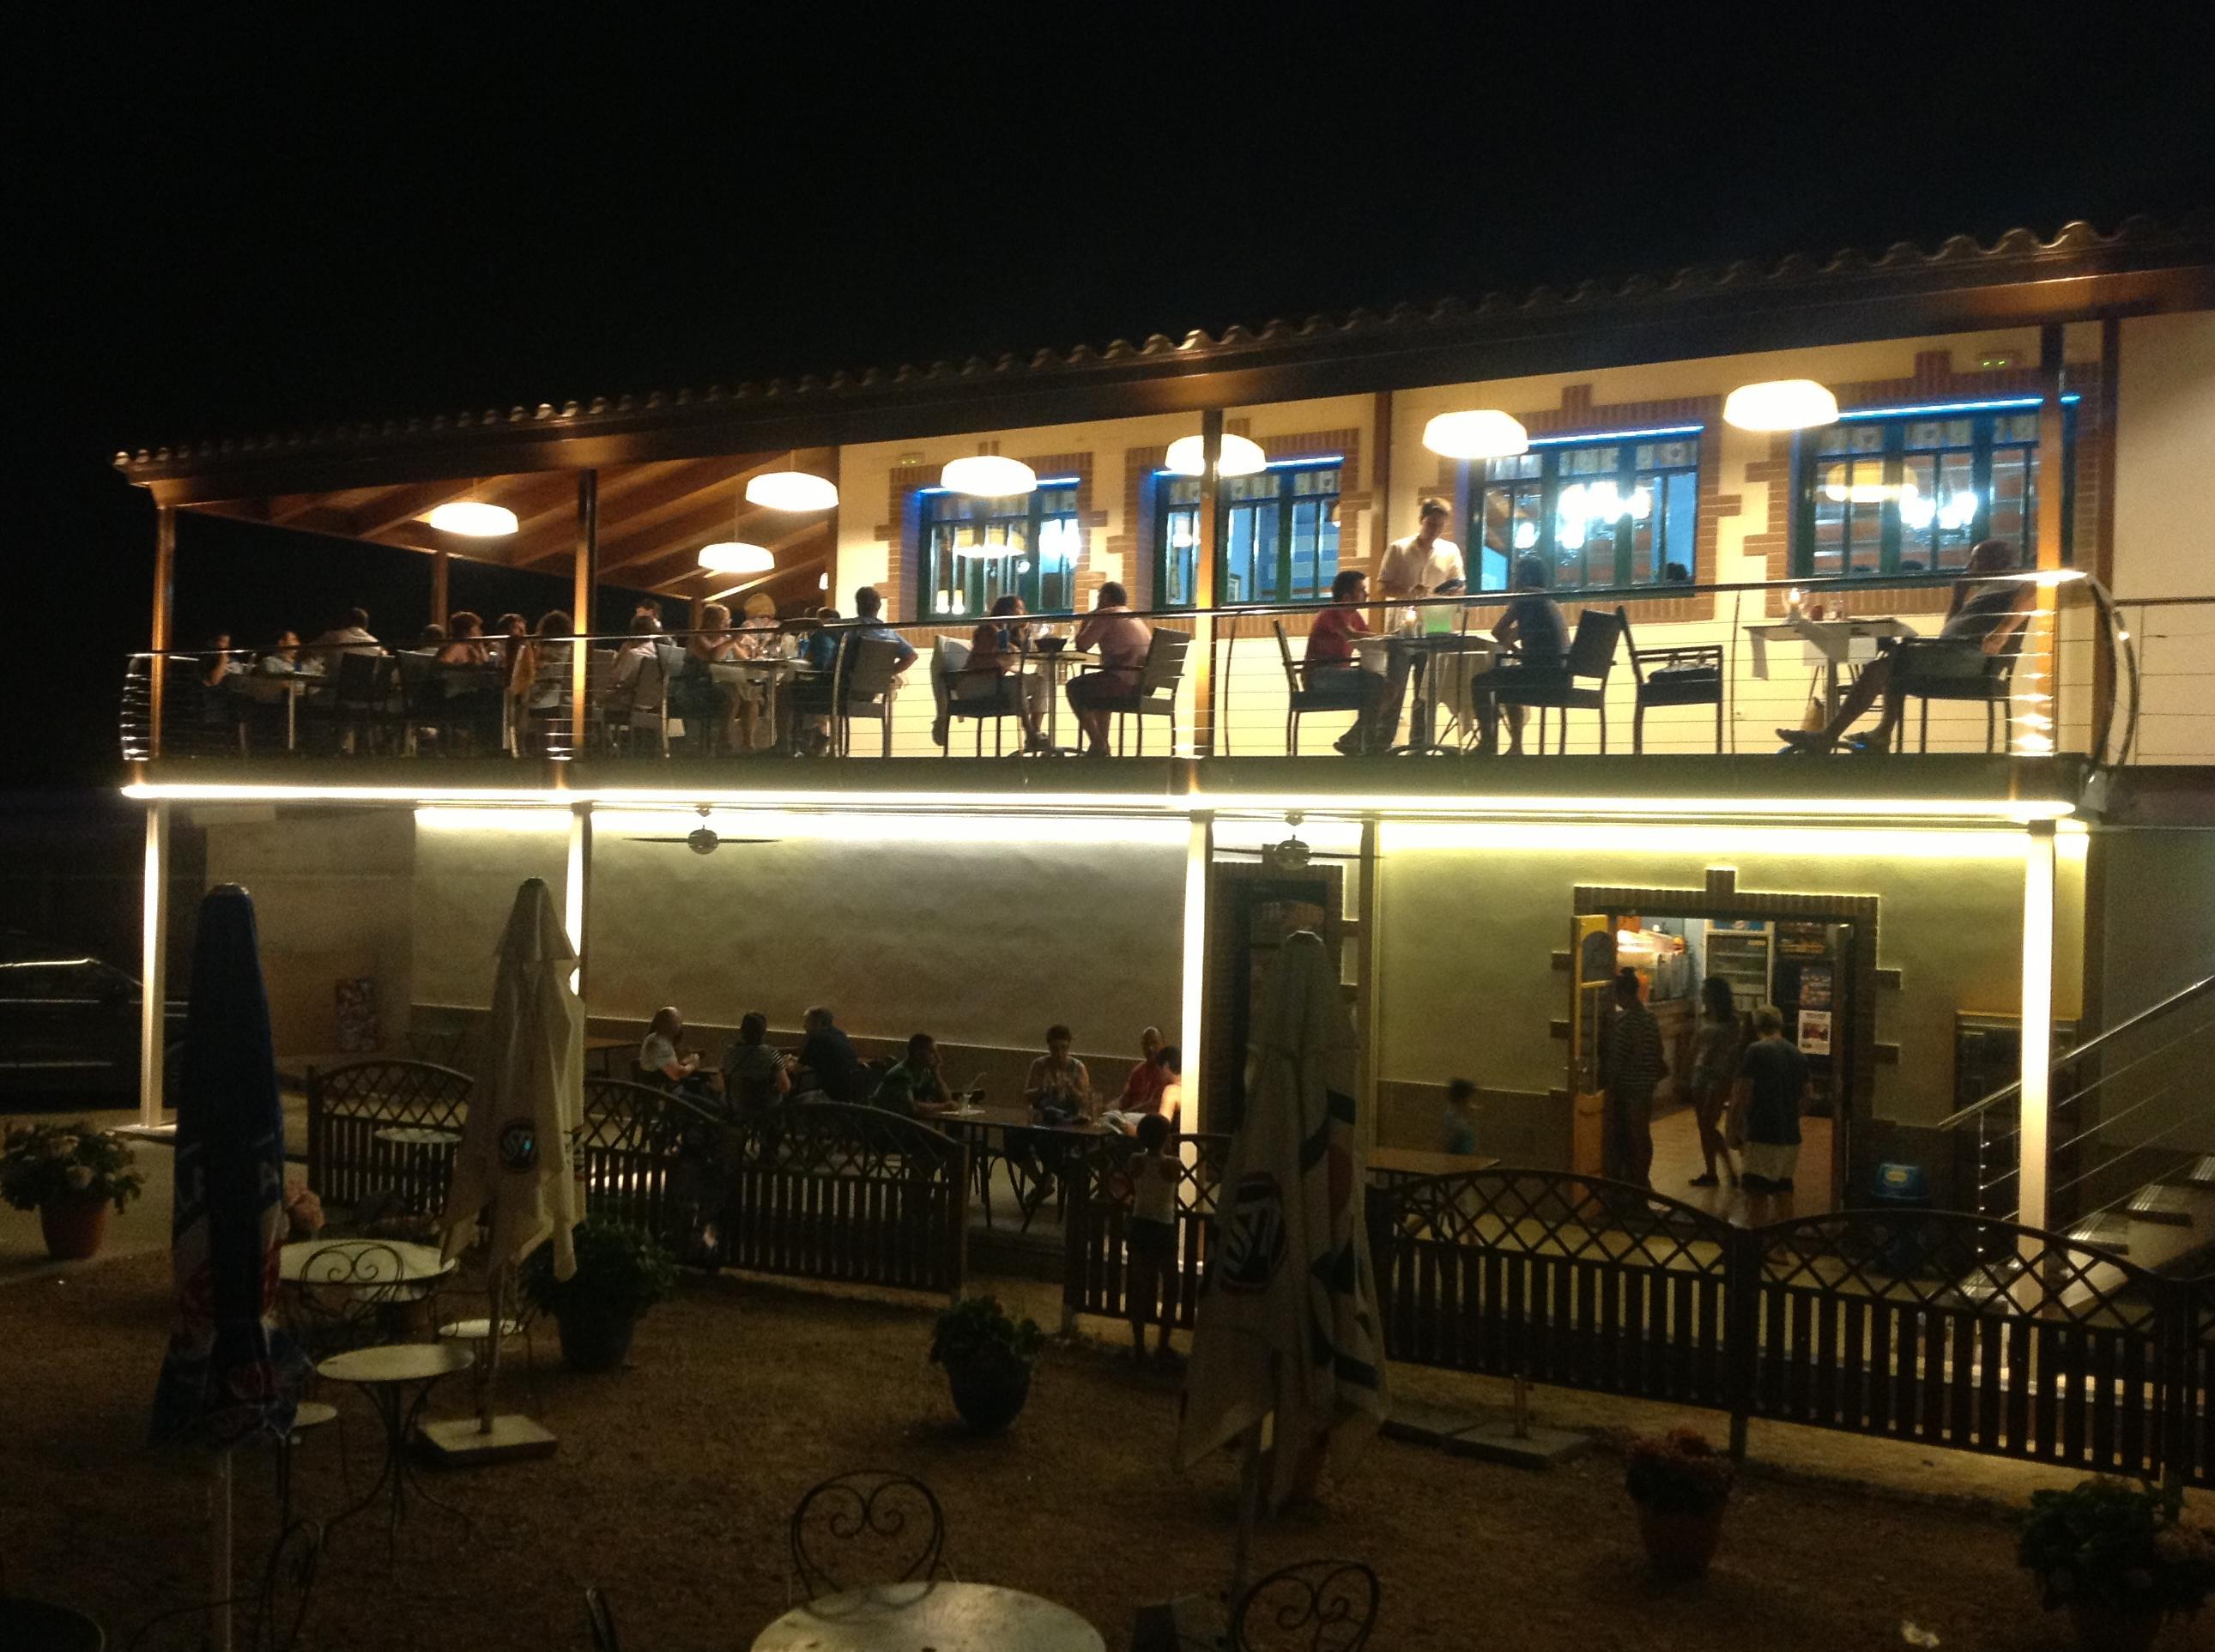 Iluminacion arquitectonica -Terrassa MIRATGES Raco del Riu